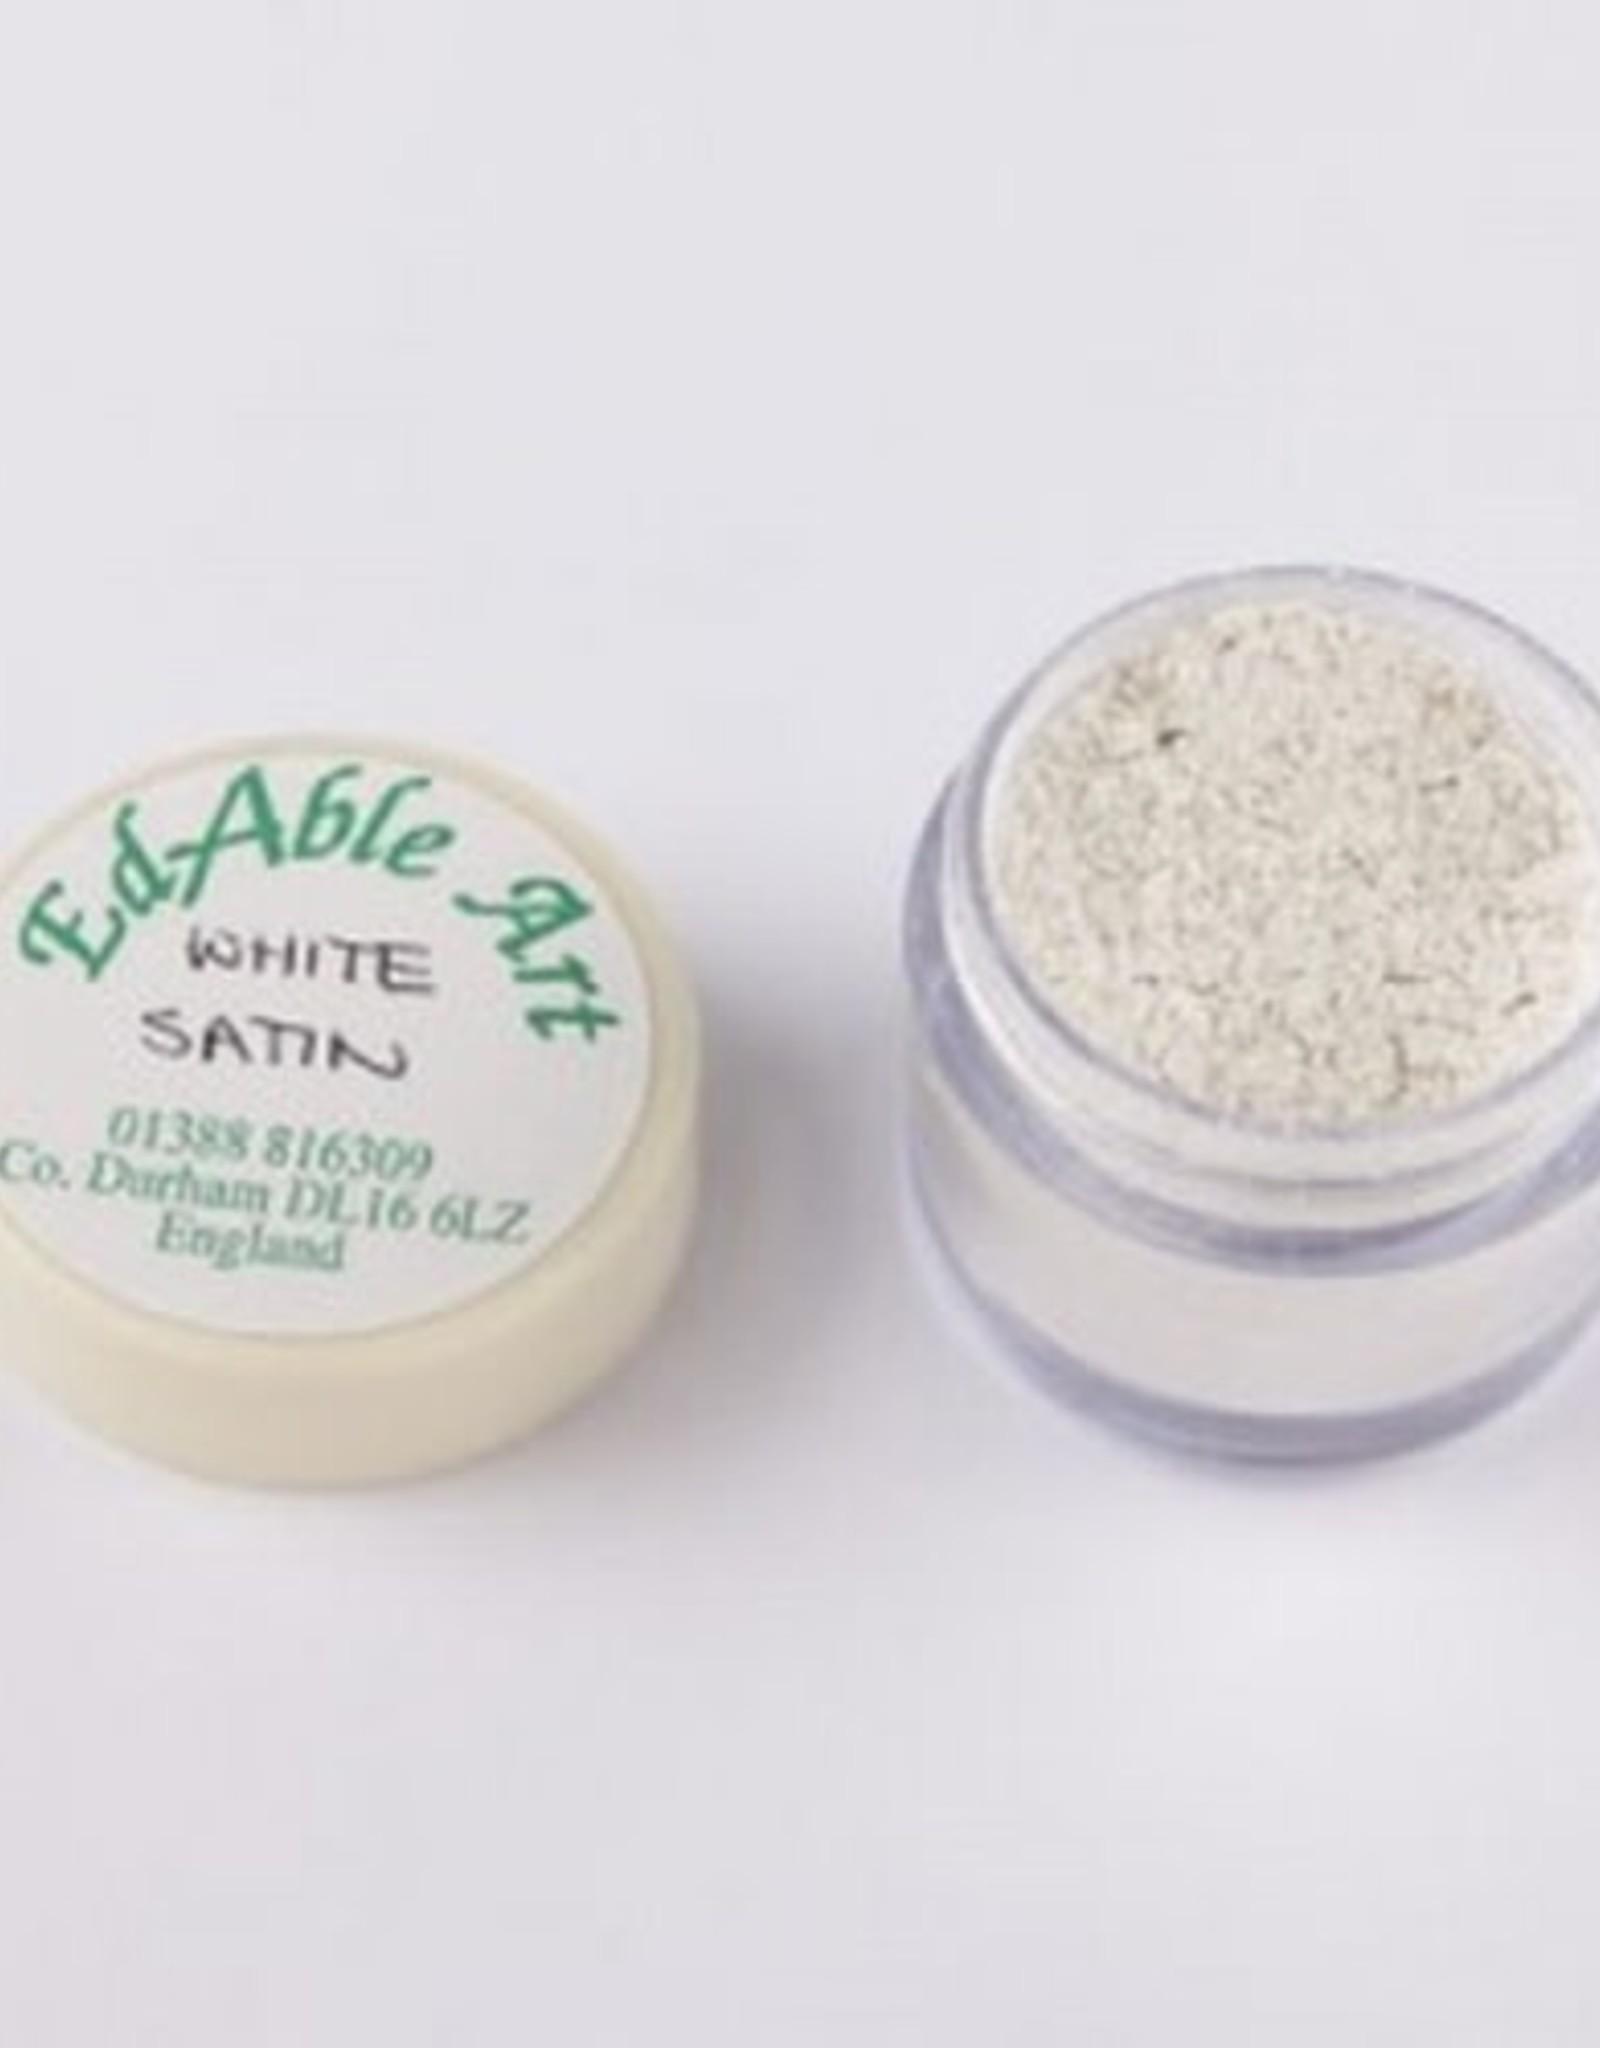 EdAble Art EdAble Art Tints & Pearls White Satin